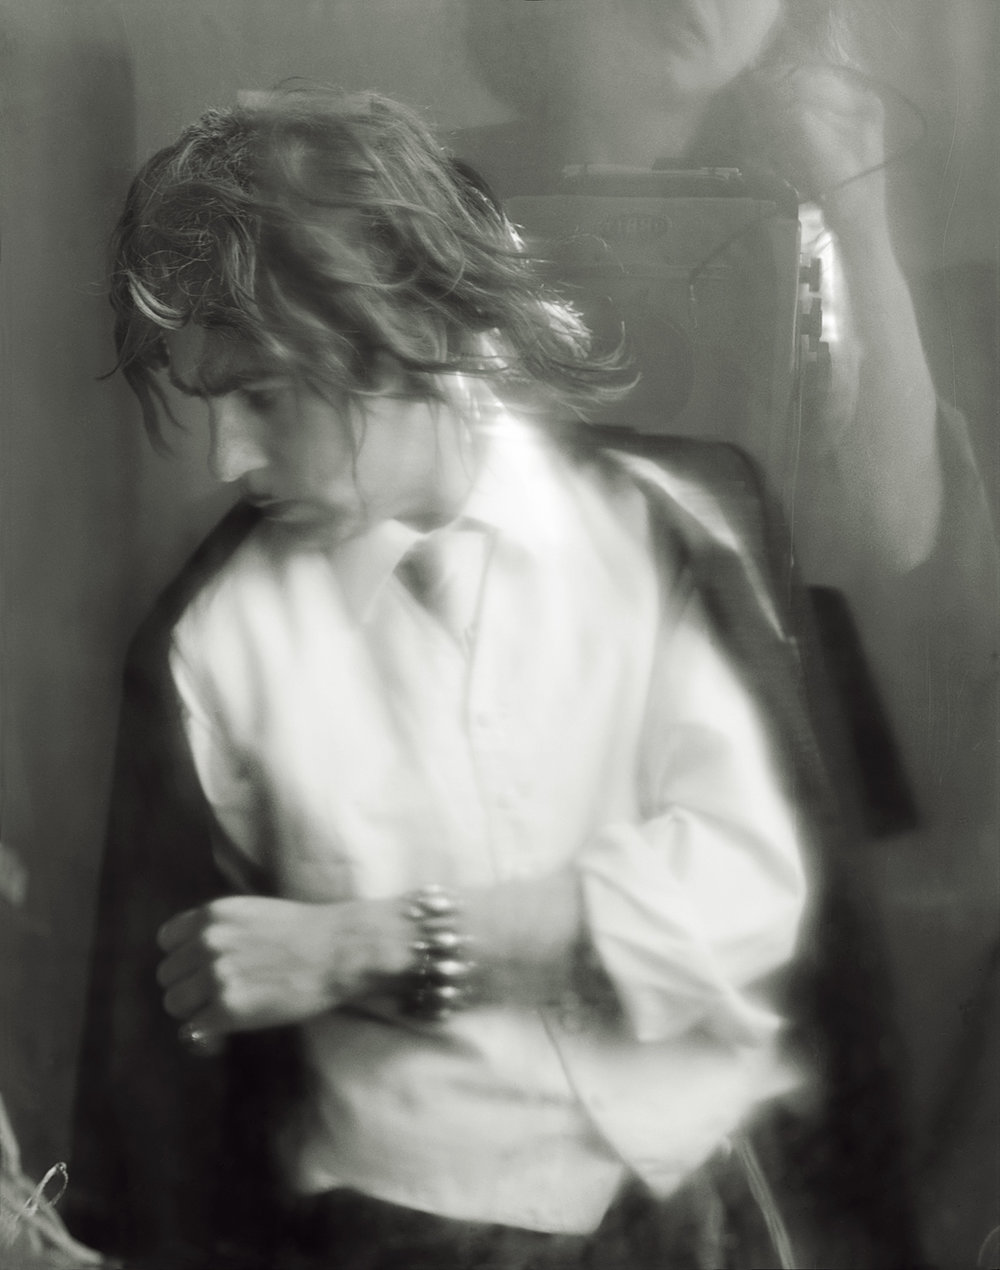 Daniel Murtagh